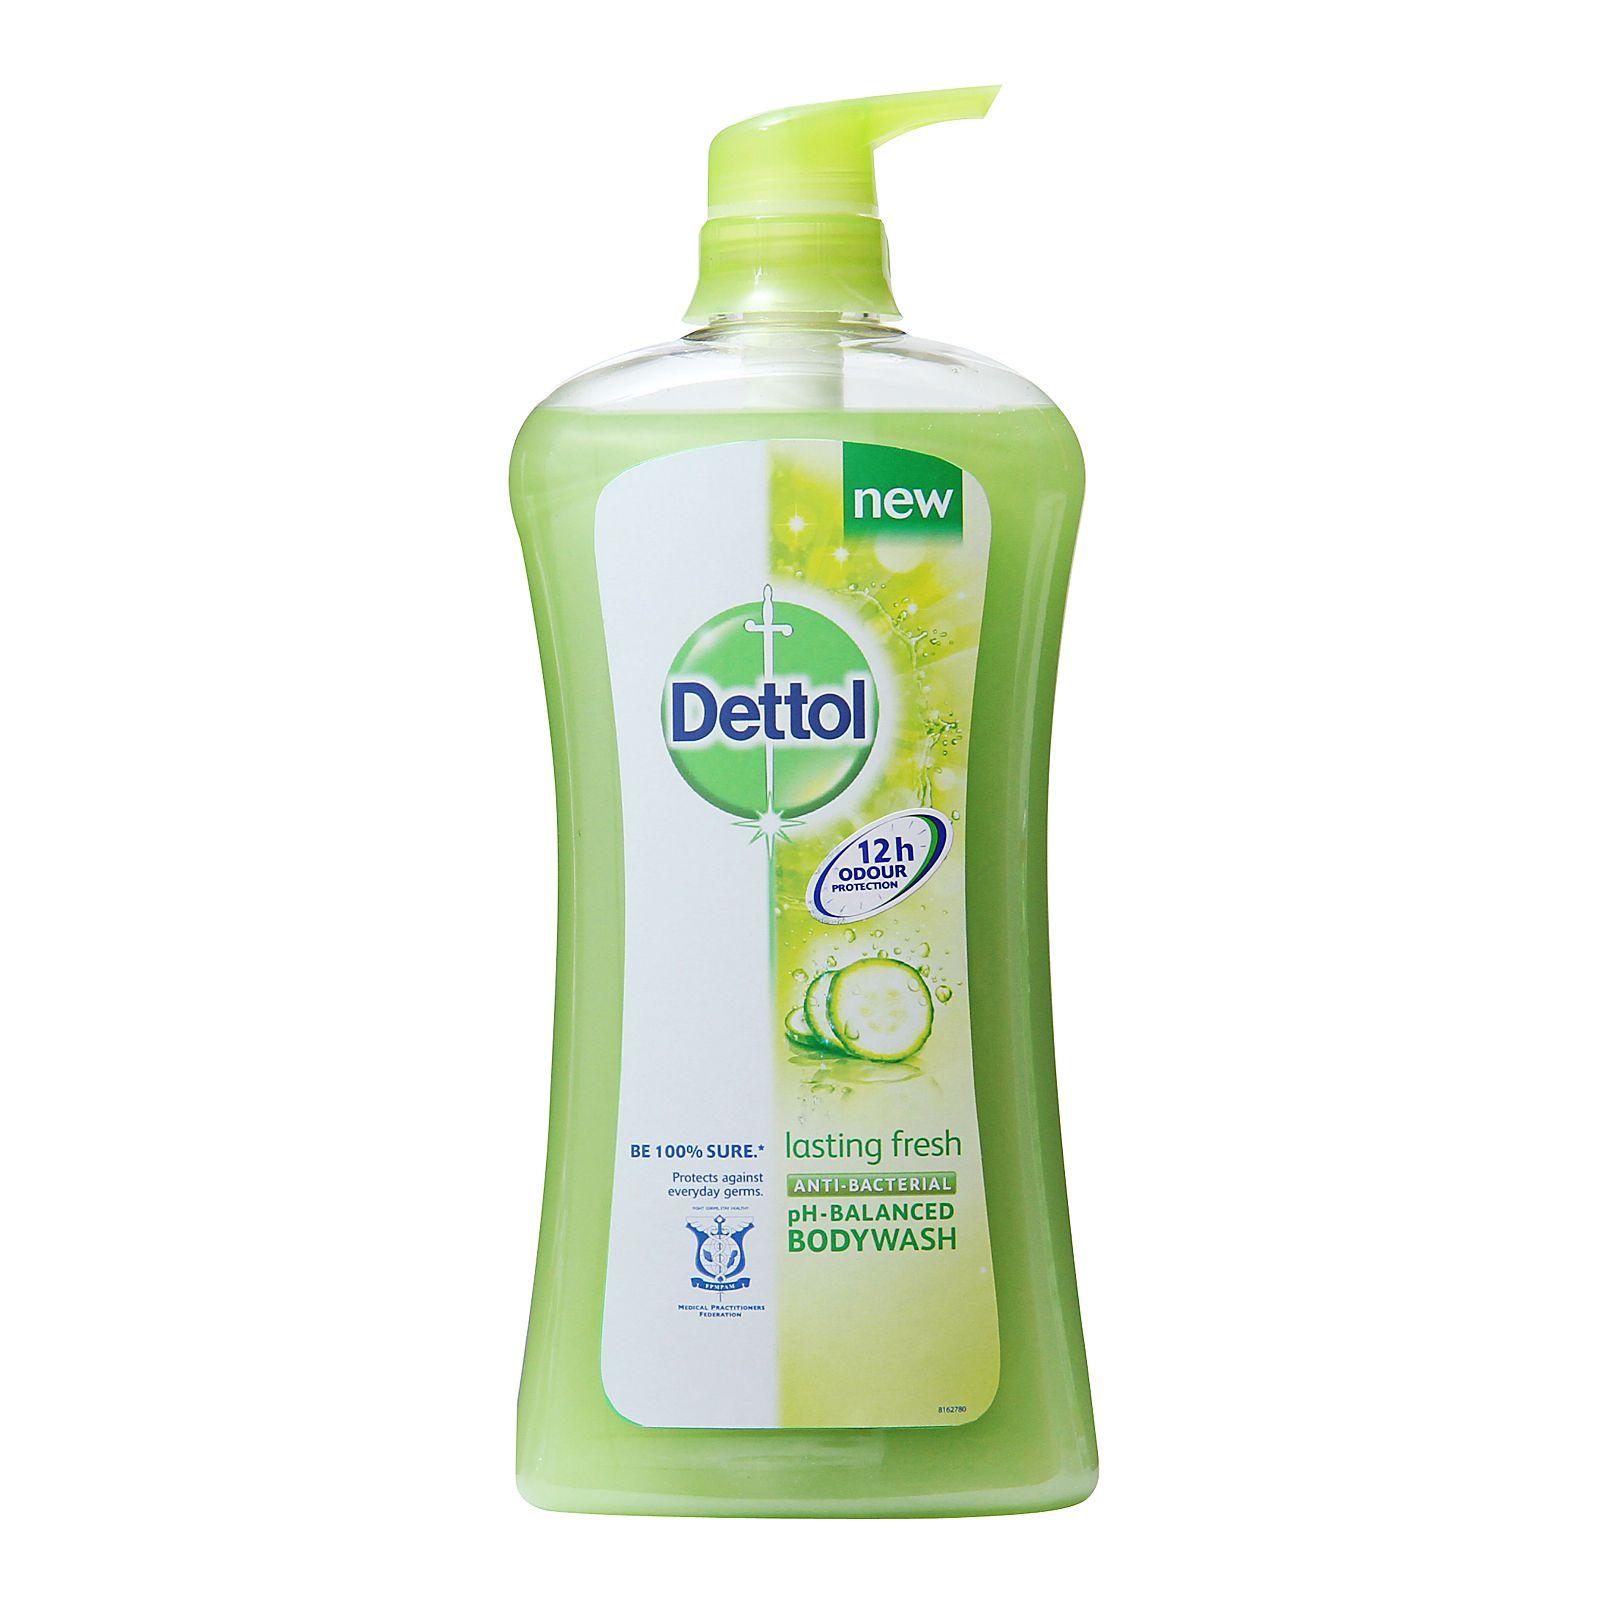 Dettol Anti Bacterial Shower Gel Lasting Fresh Redmart Delight Detol Bodywash Body Wash